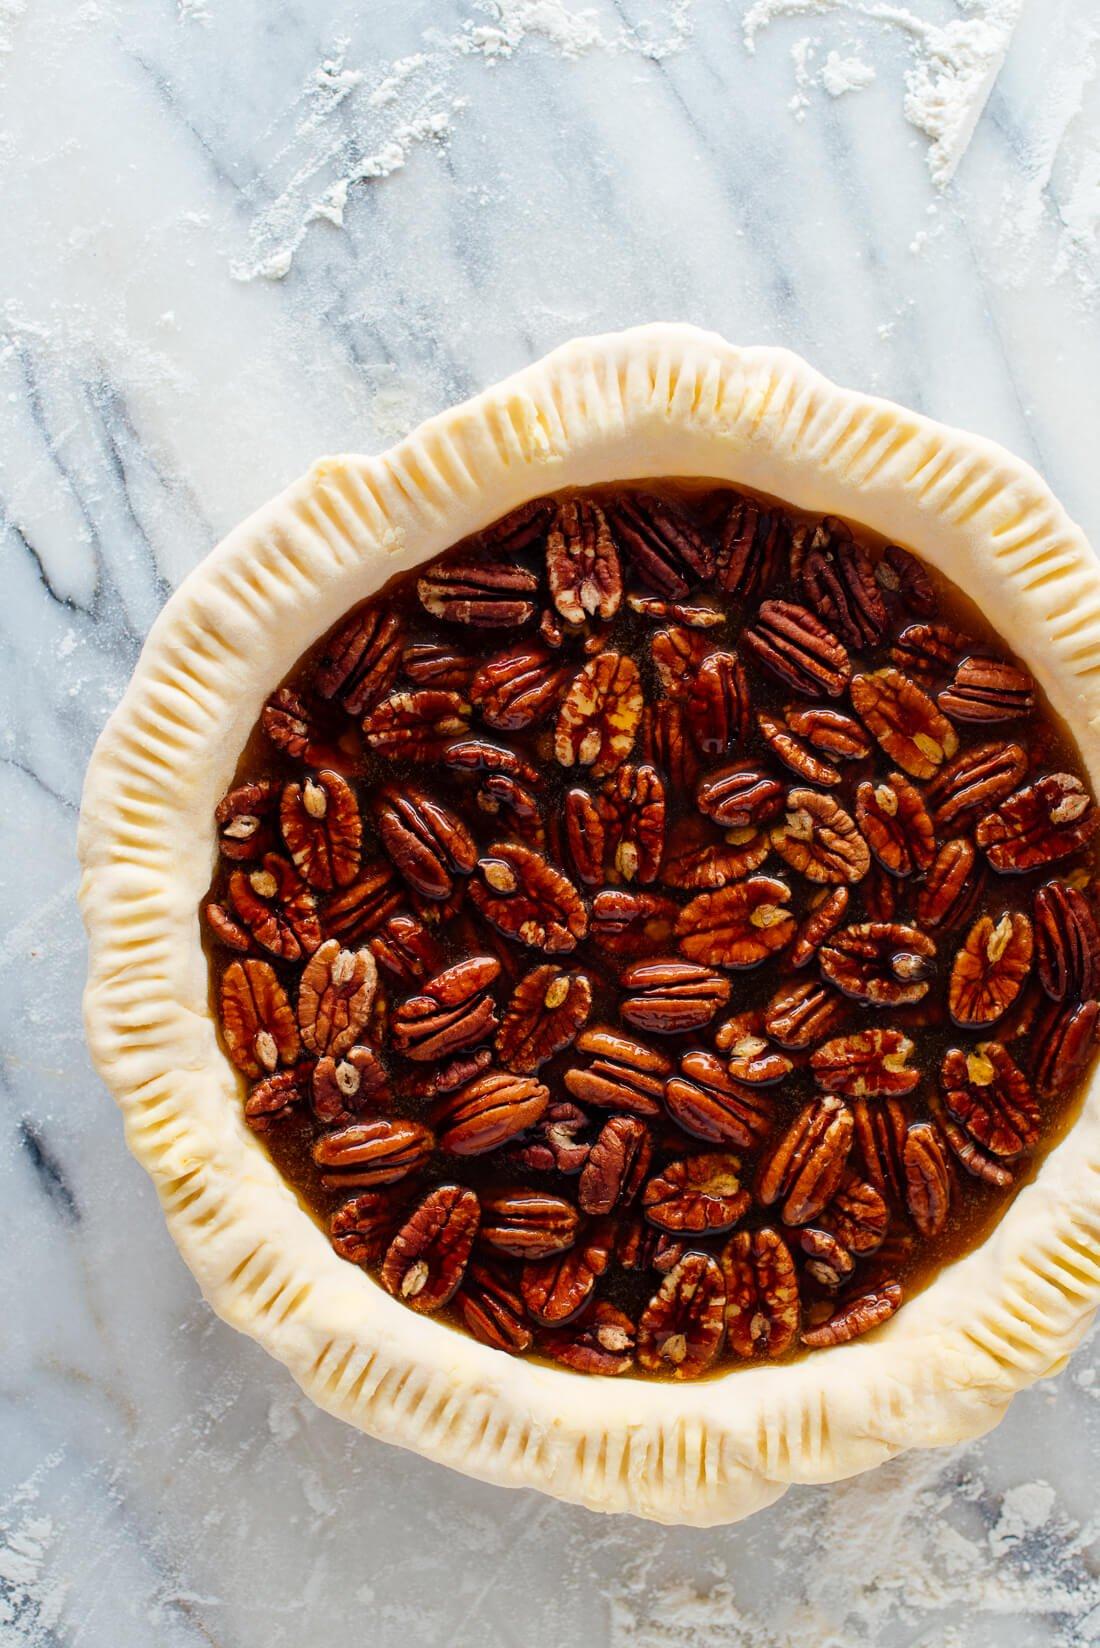 maple pecan pie (ready to bake)